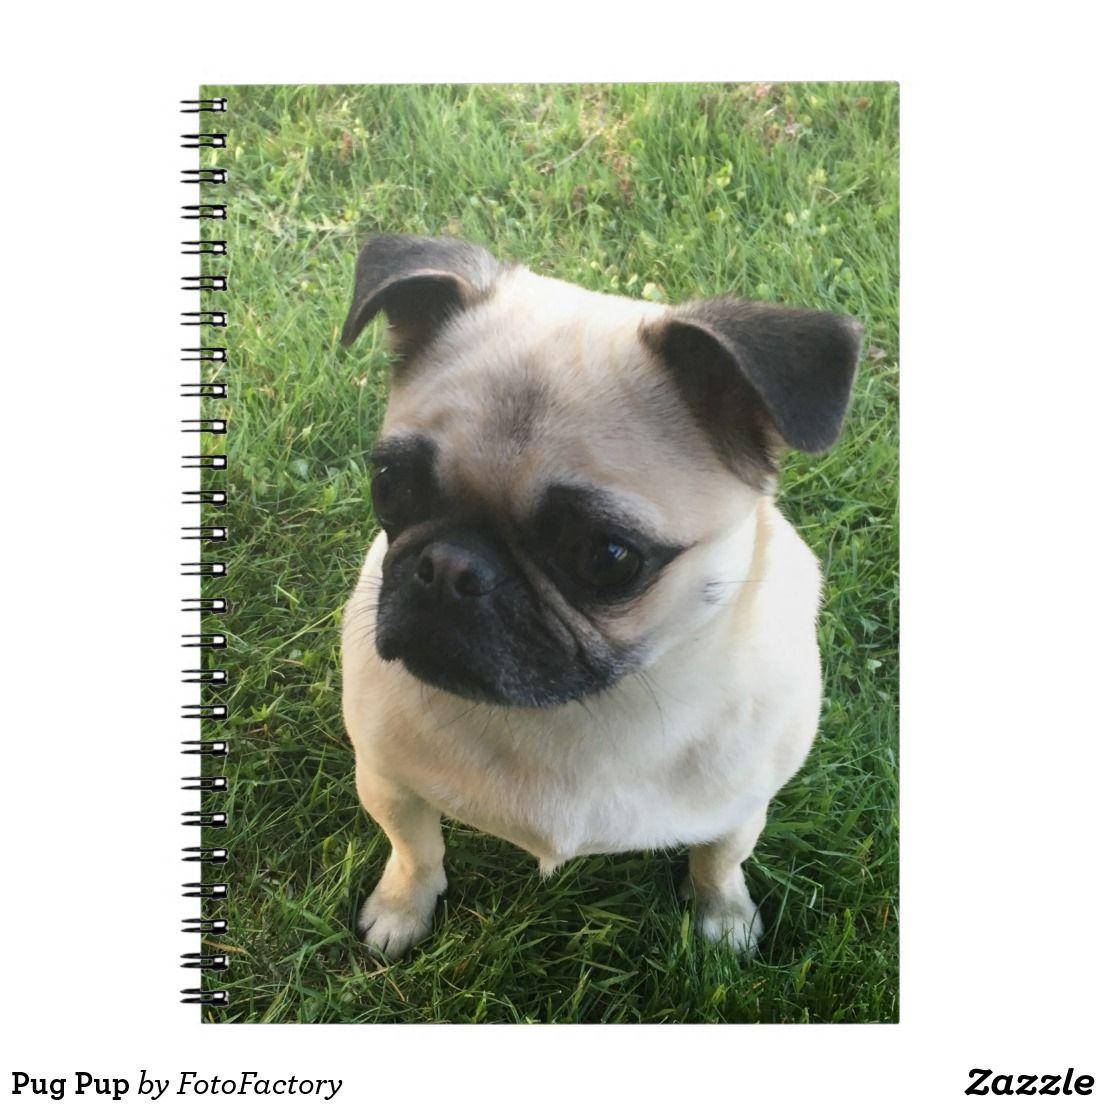 Pug Pup Notebook Zazzle Com Pugs Puppy Sitting Pup